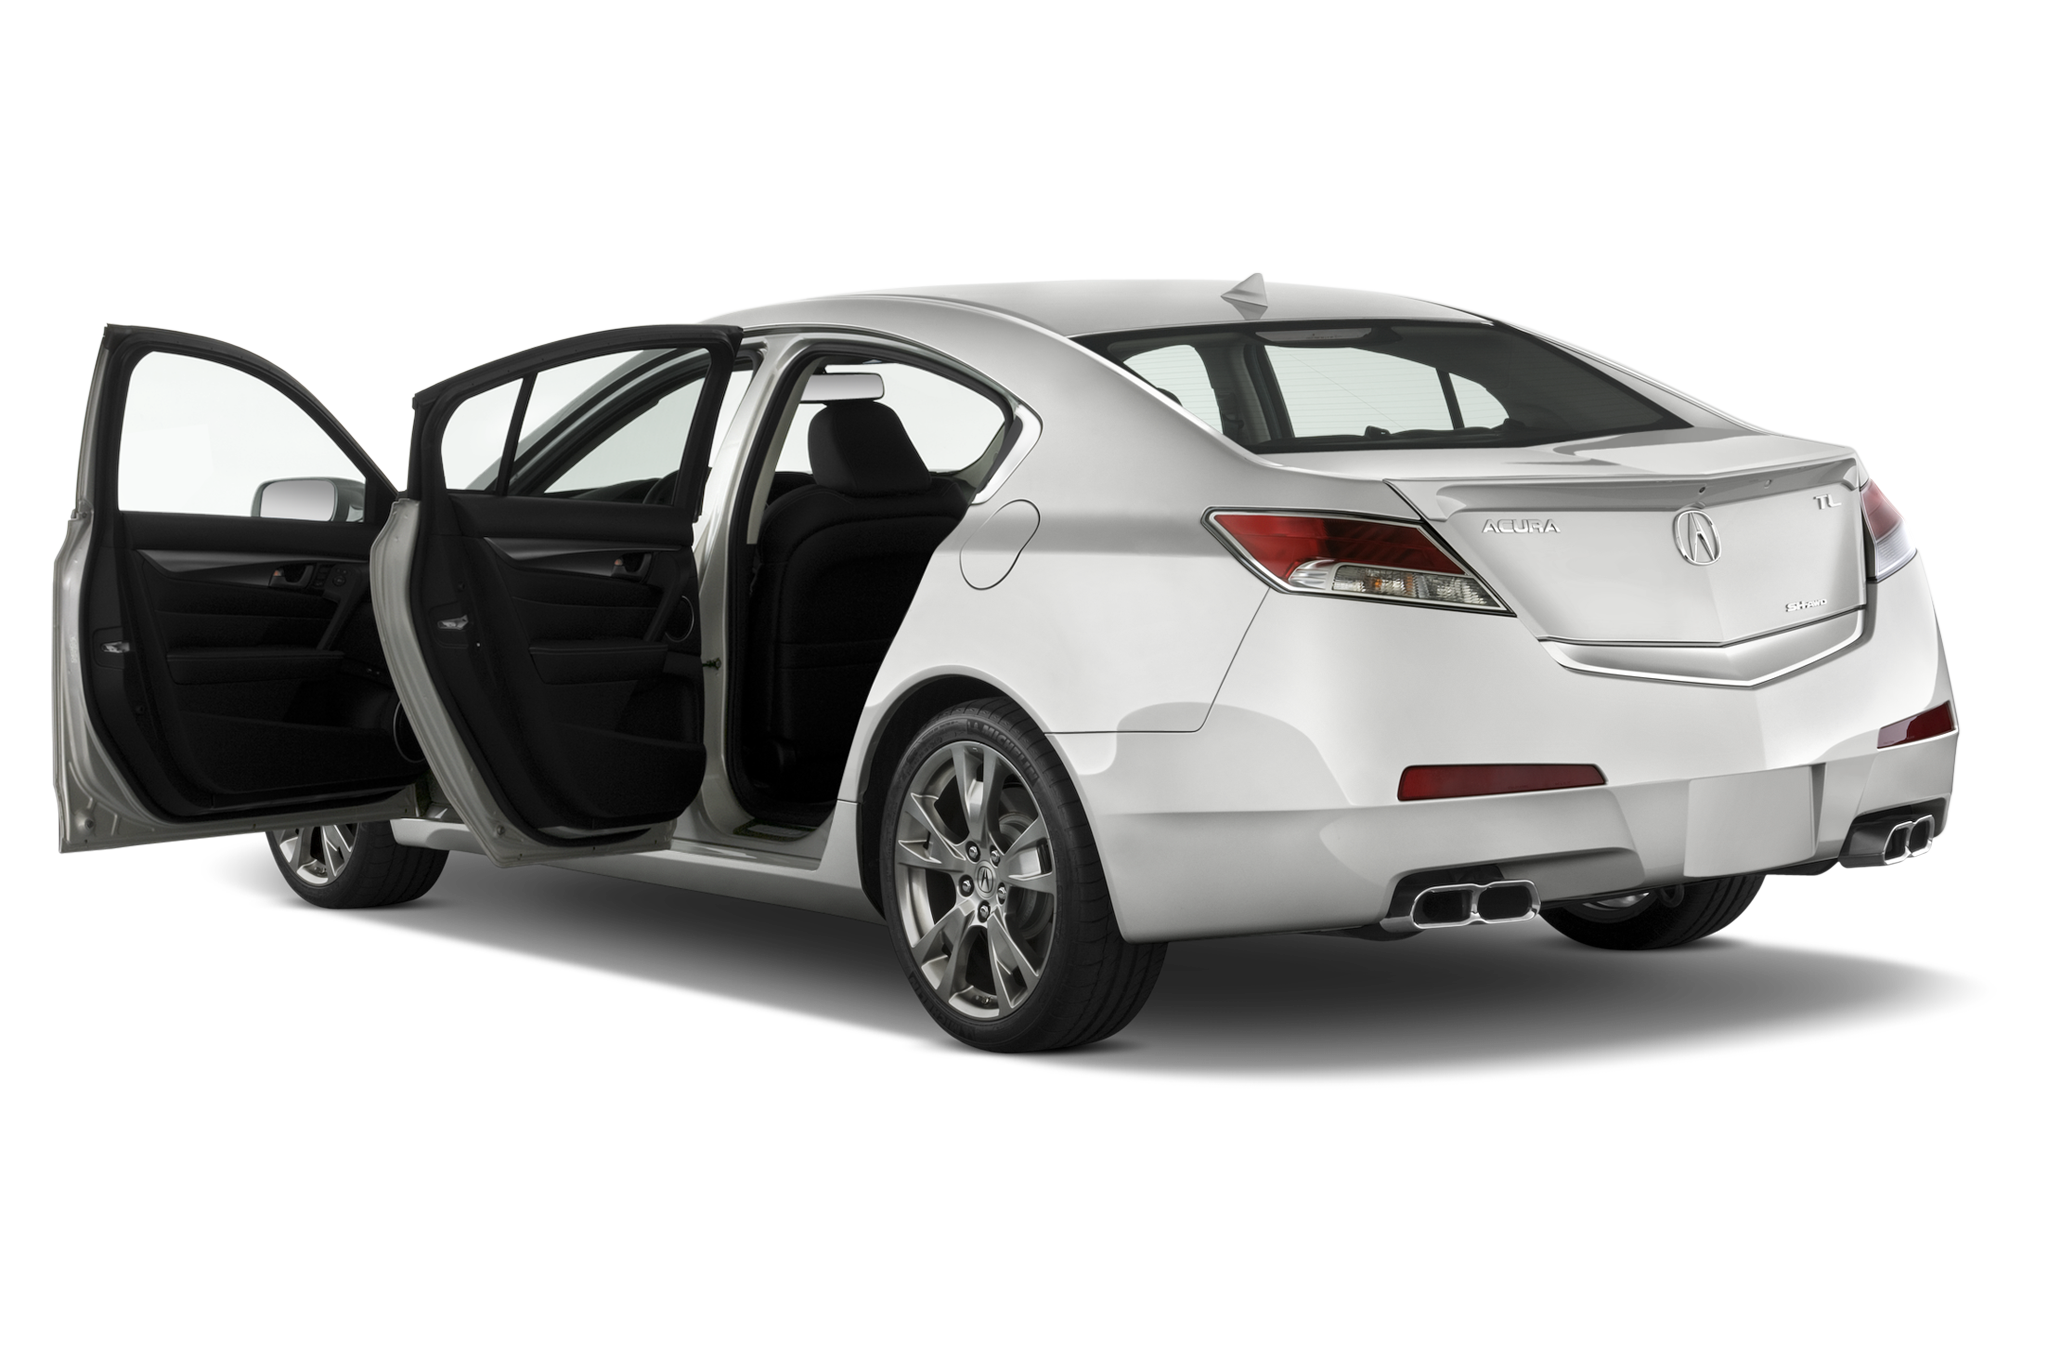 Acura TL IV Restyling 2011 - 2014 Sedan #2